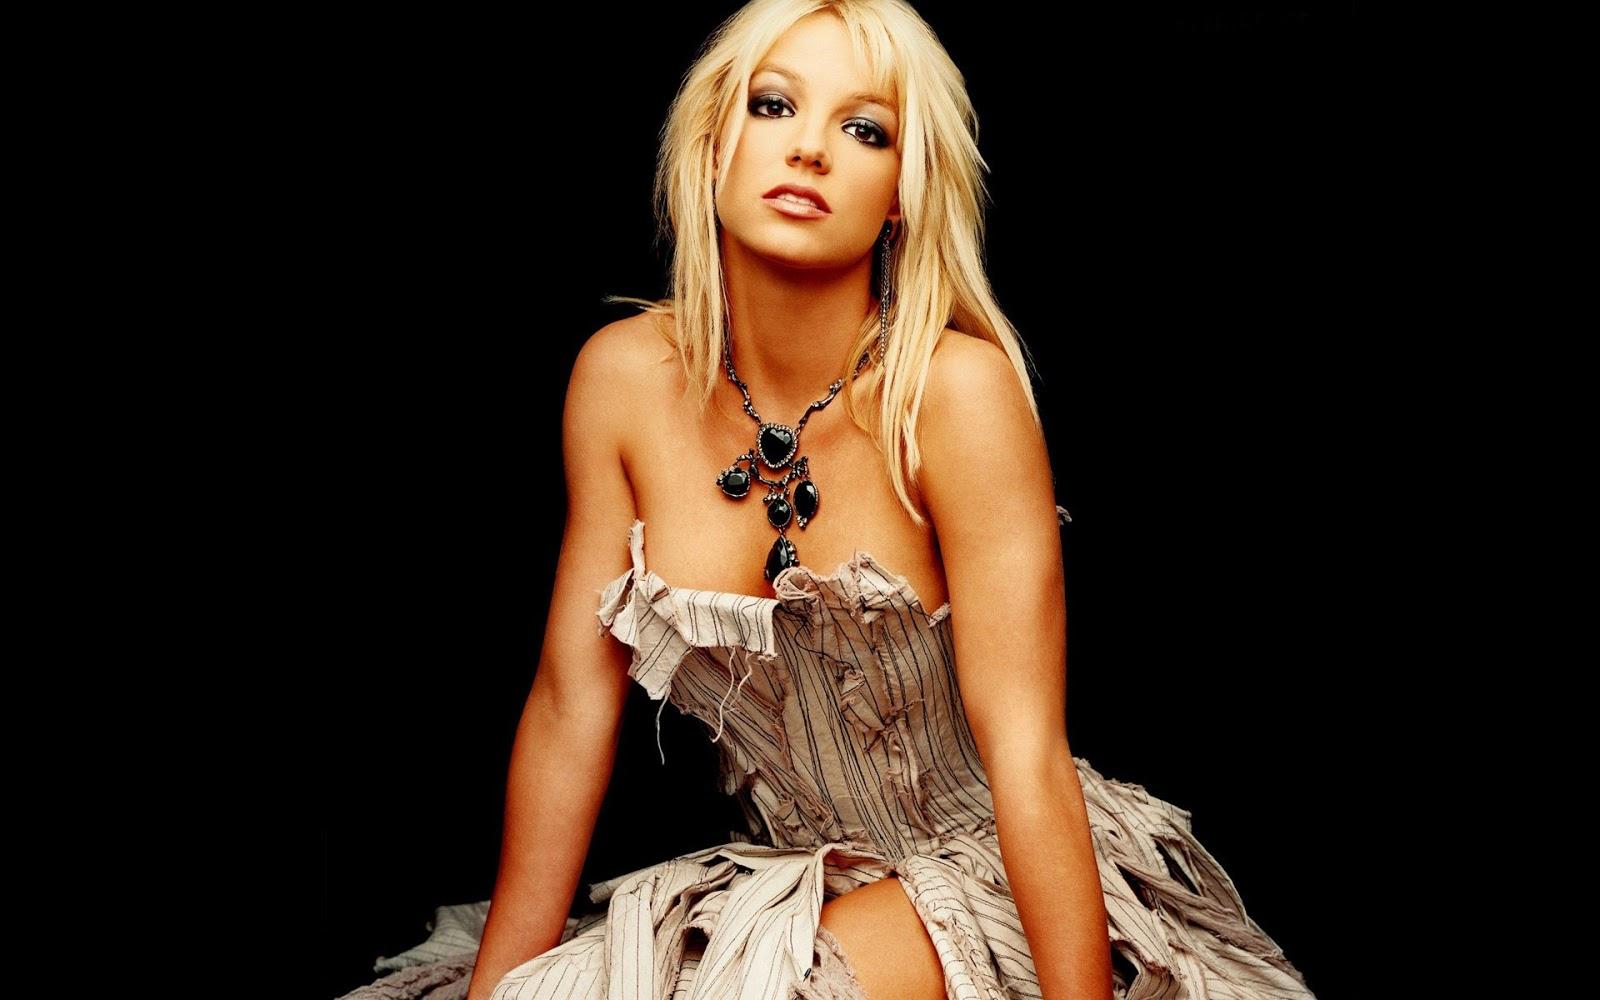 Britney Spears Black Background